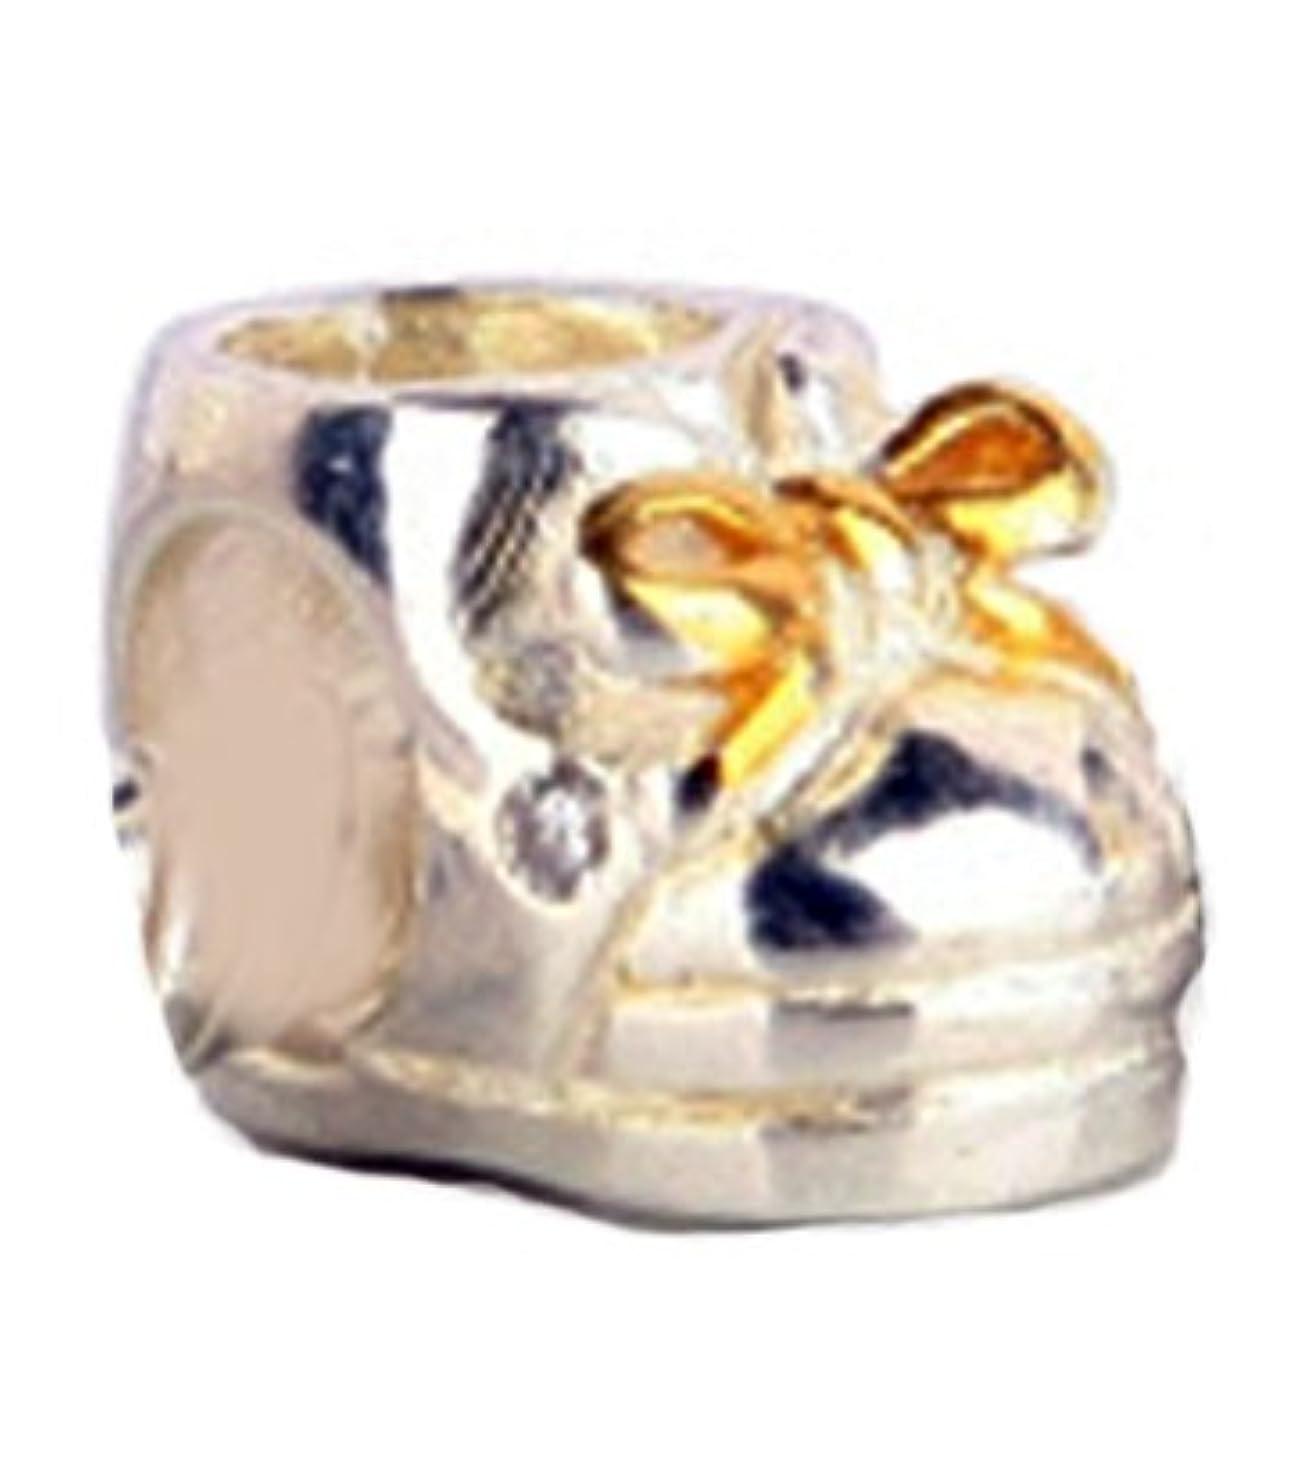 Golden Over Baby Shoe Charm Bead - .925 Sterling Silver - Fits Pandora Charm Bracelet